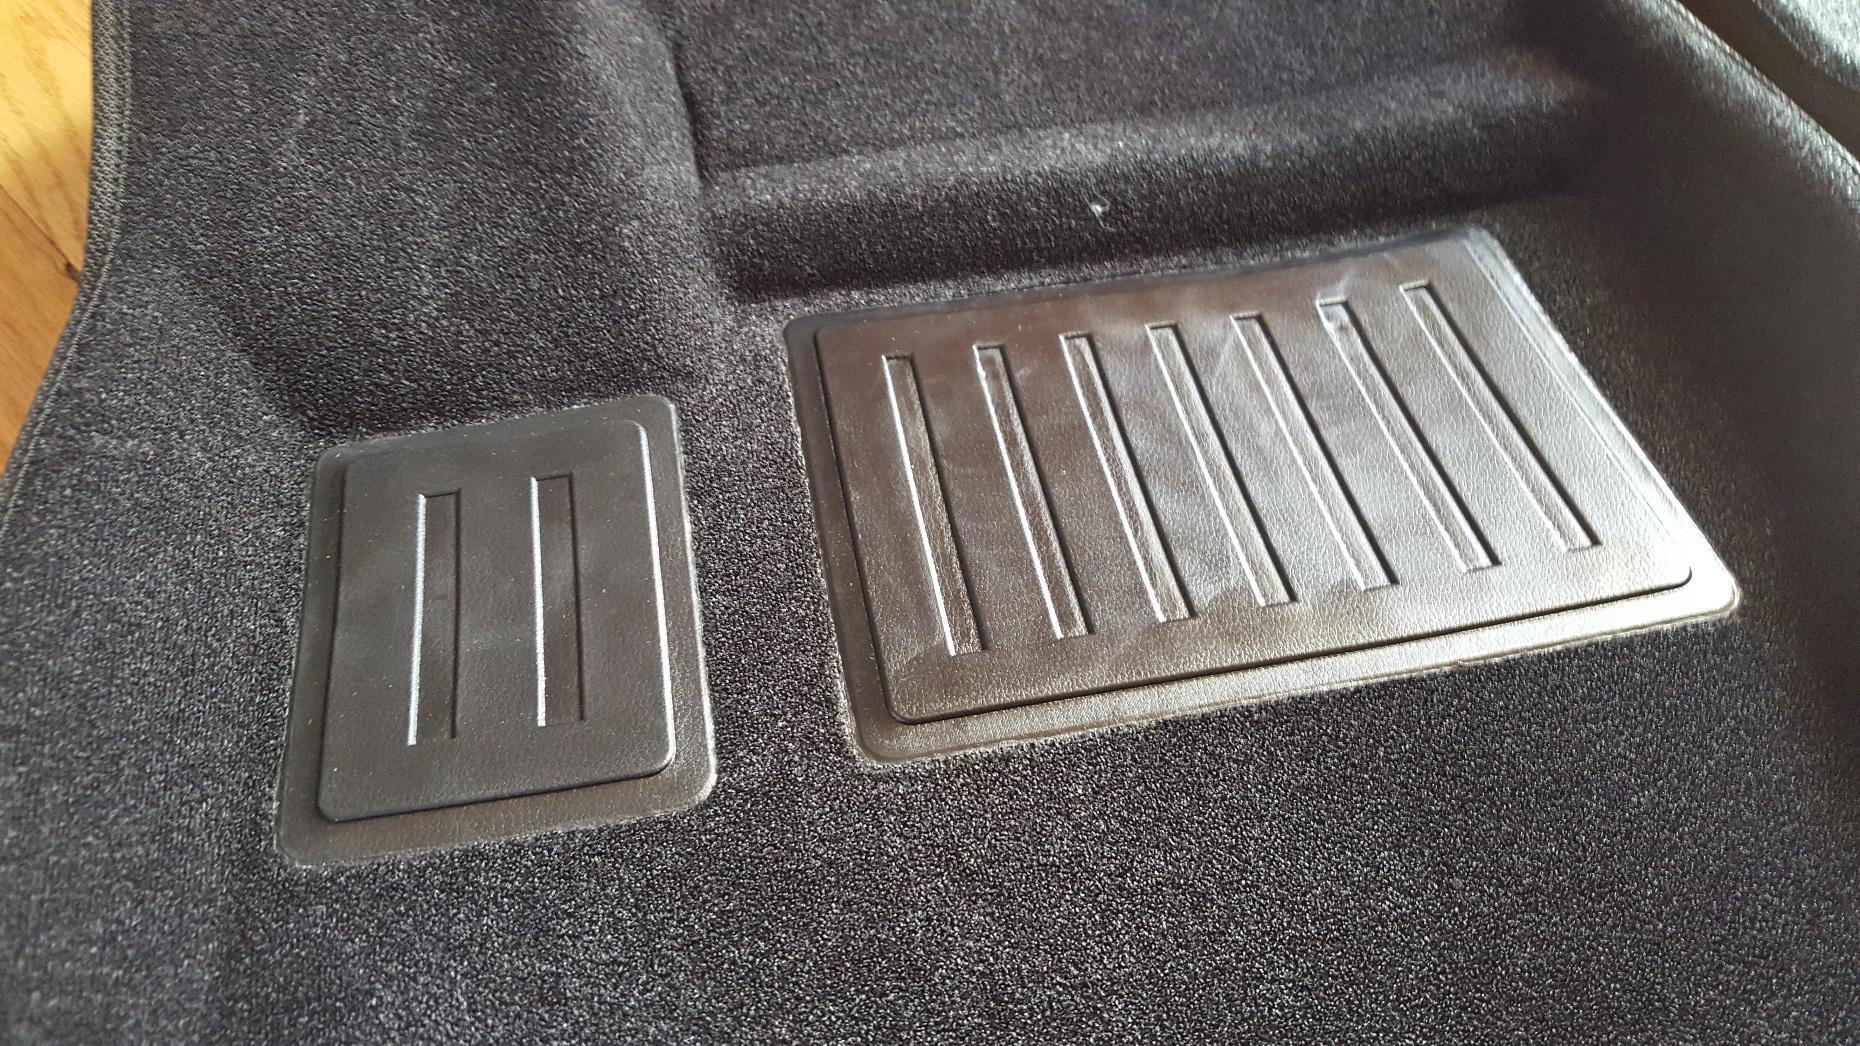 Floor mats xterra - Name 20151119_144209 Jpg Views 969 Size 1 04 Mb